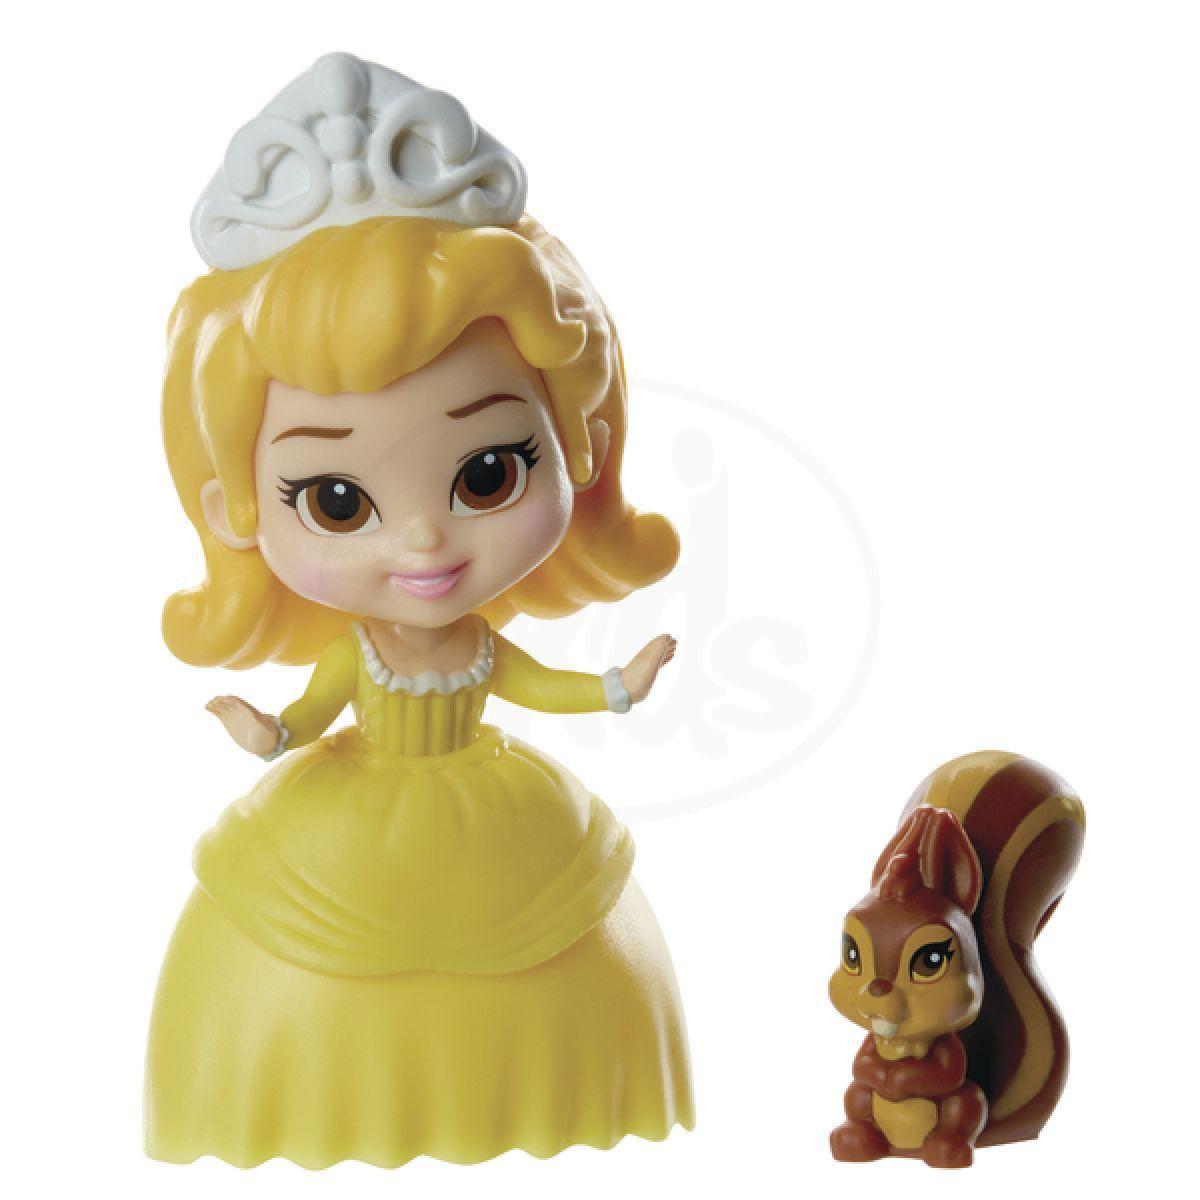 Jakks Pacific Disney Mini princezna a kamarád - Amber and Whatnaught